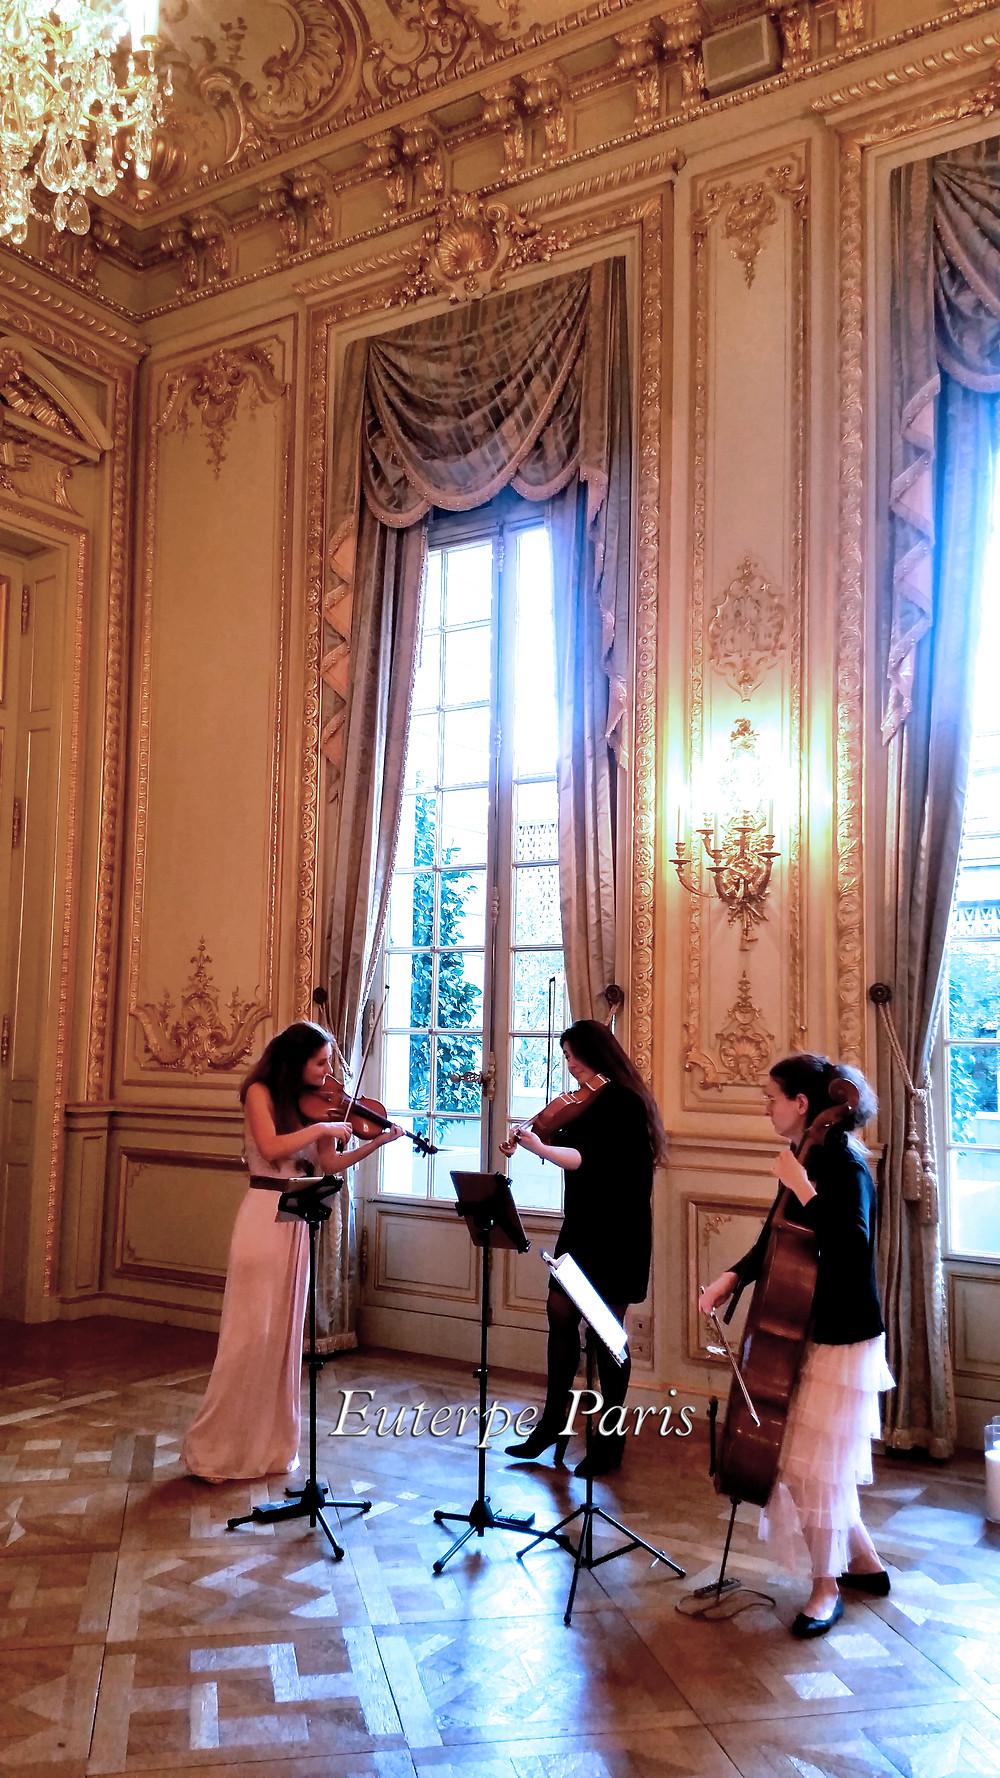 Shangri-La Paris wedding music in france, euterpe paris, trio cordes, quatuor a cordes, musique reception, musique mariage paris